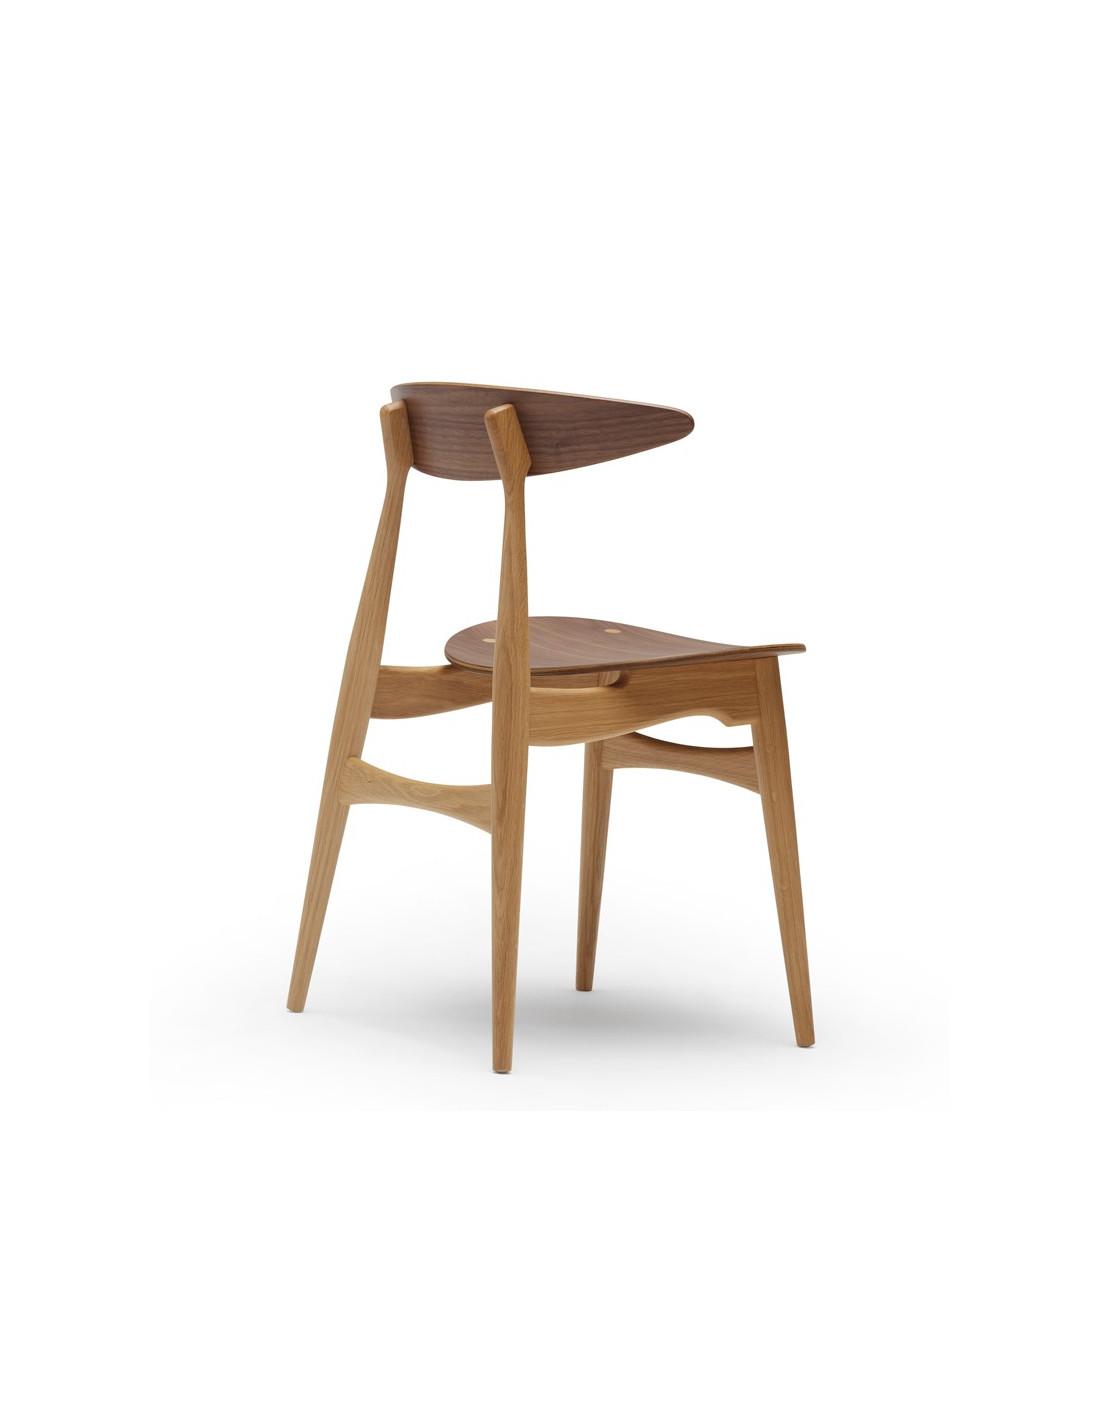 chaise ch33 design hans j wegner par carl hansen la. Black Bedroom Furniture Sets. Home Design Ideas